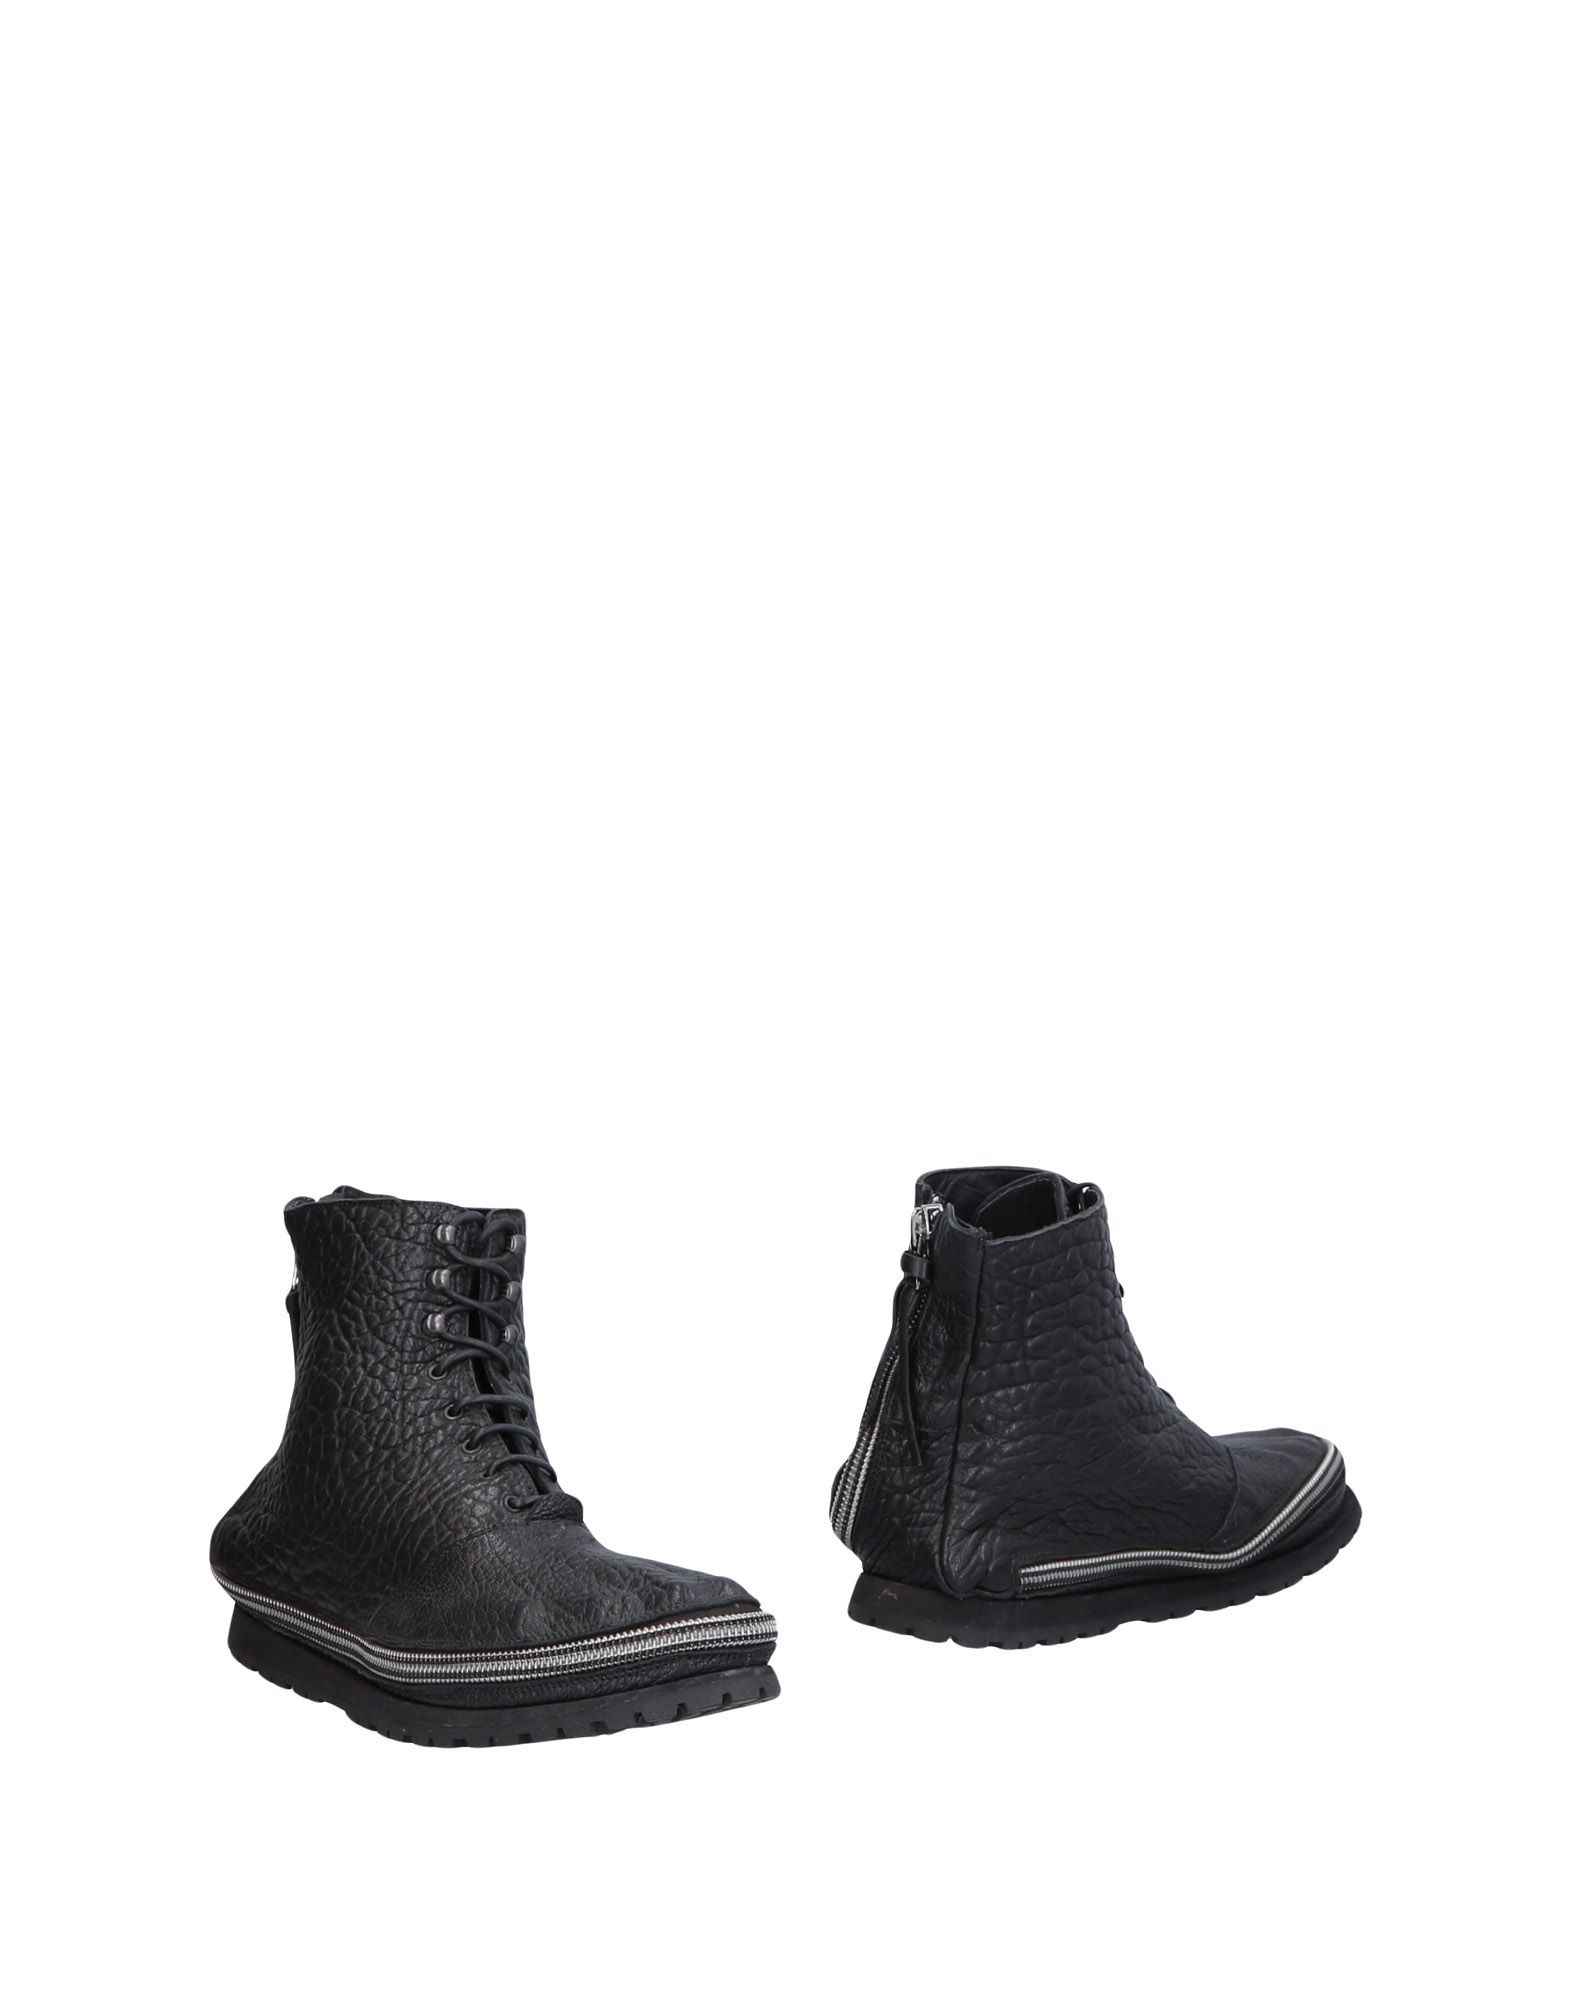 GIORGIO BRATO + VEESHOO Полусапоги и высокие ботинки цены онлайн